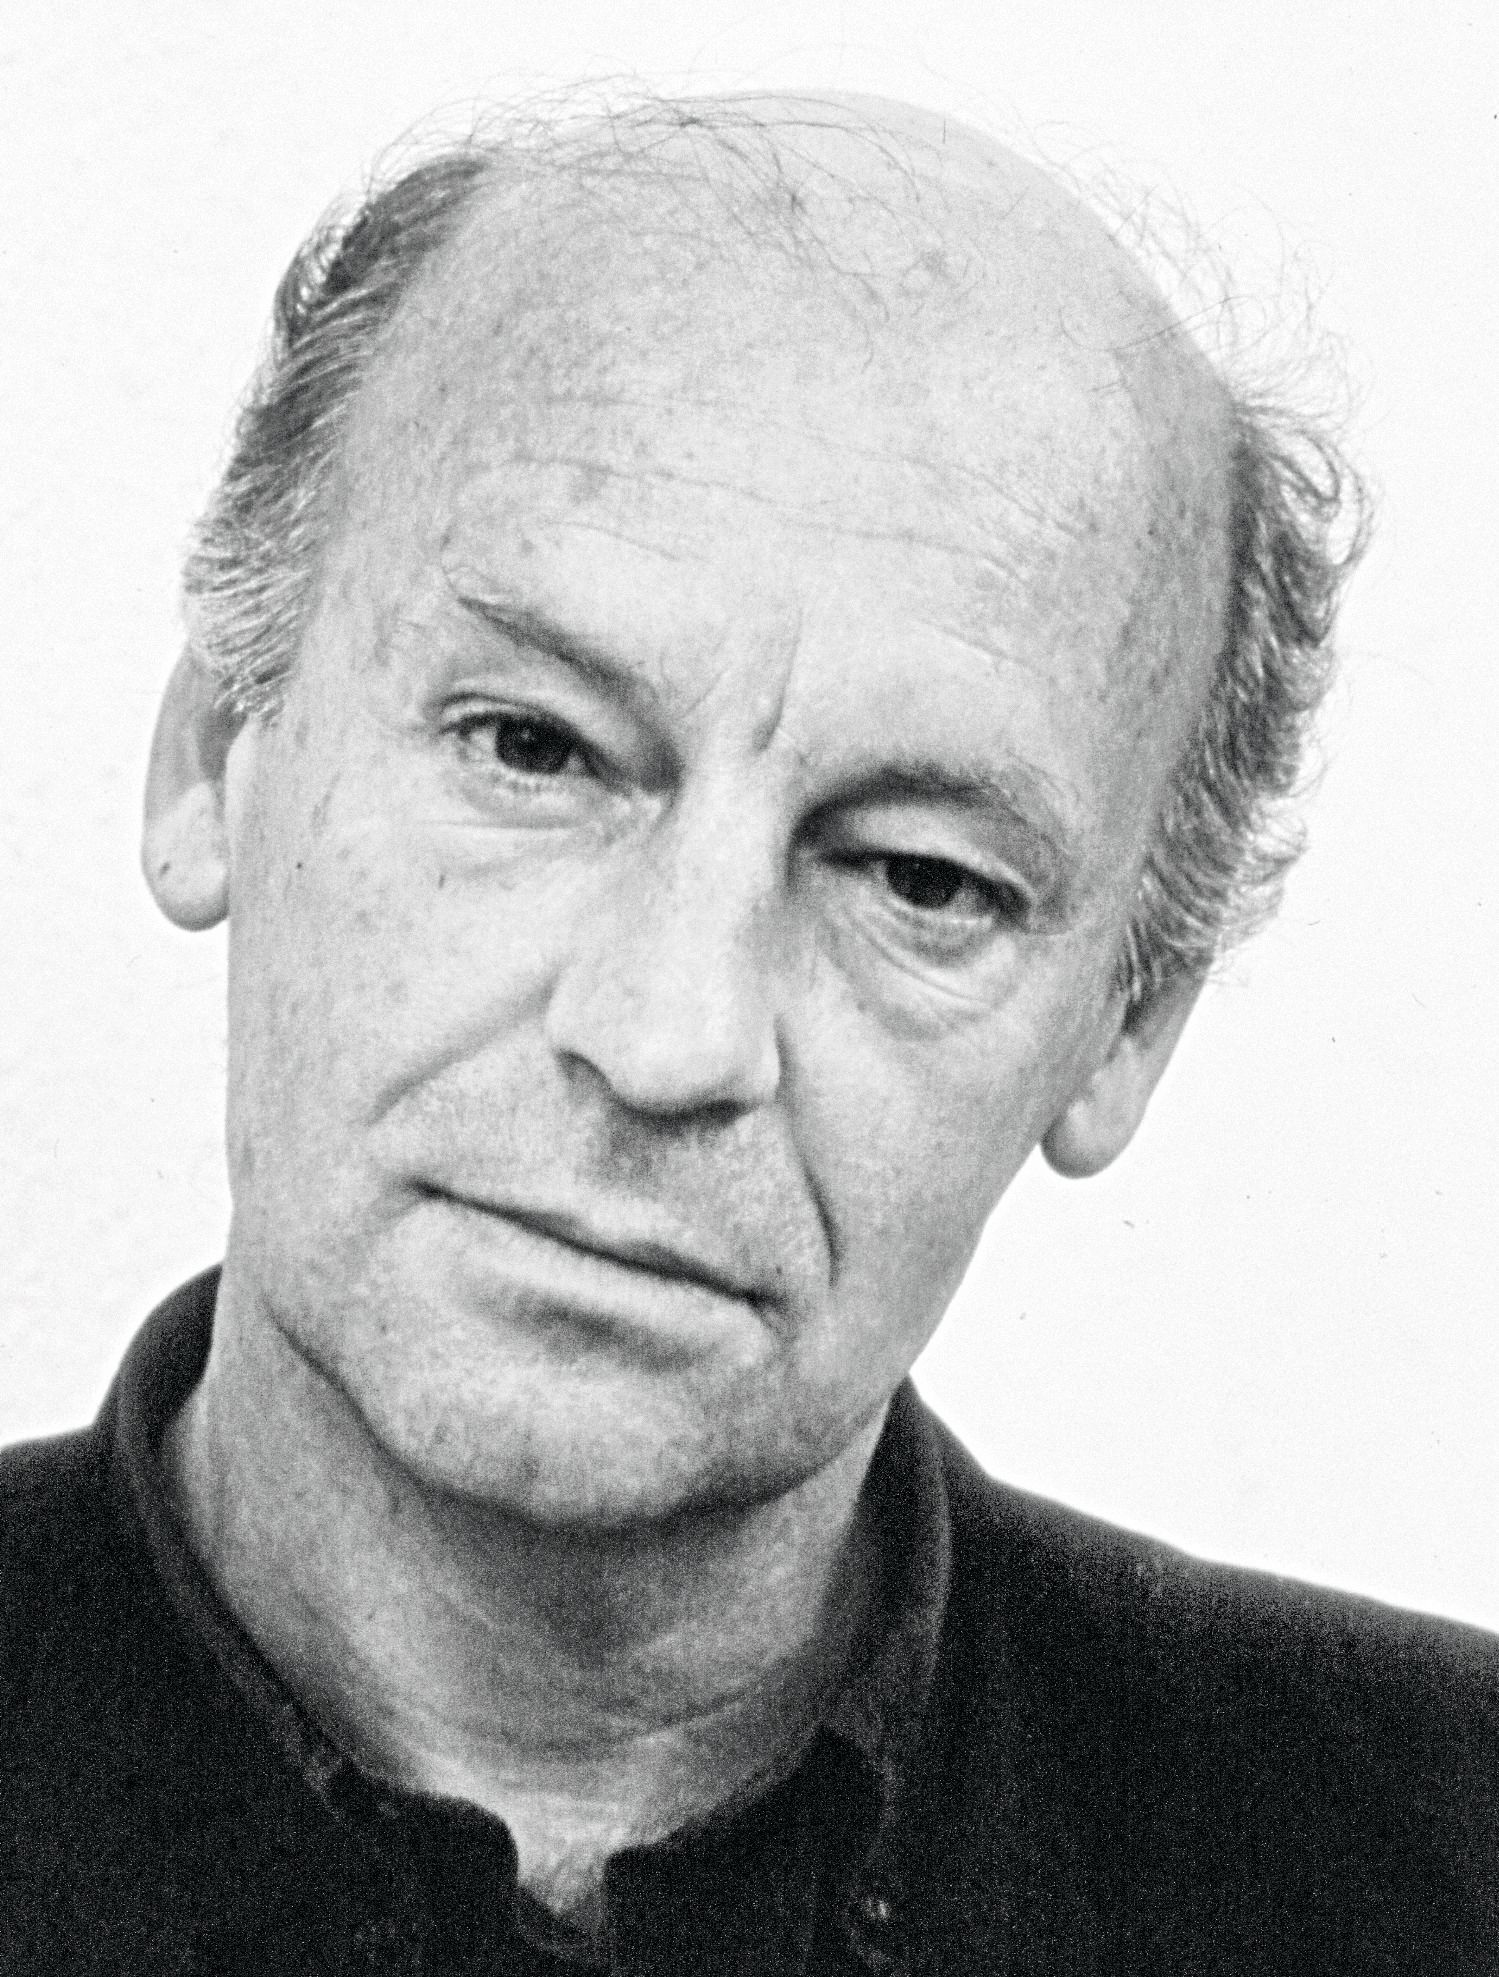 Eduardo Galeano, escritor y periodista uruguayo.